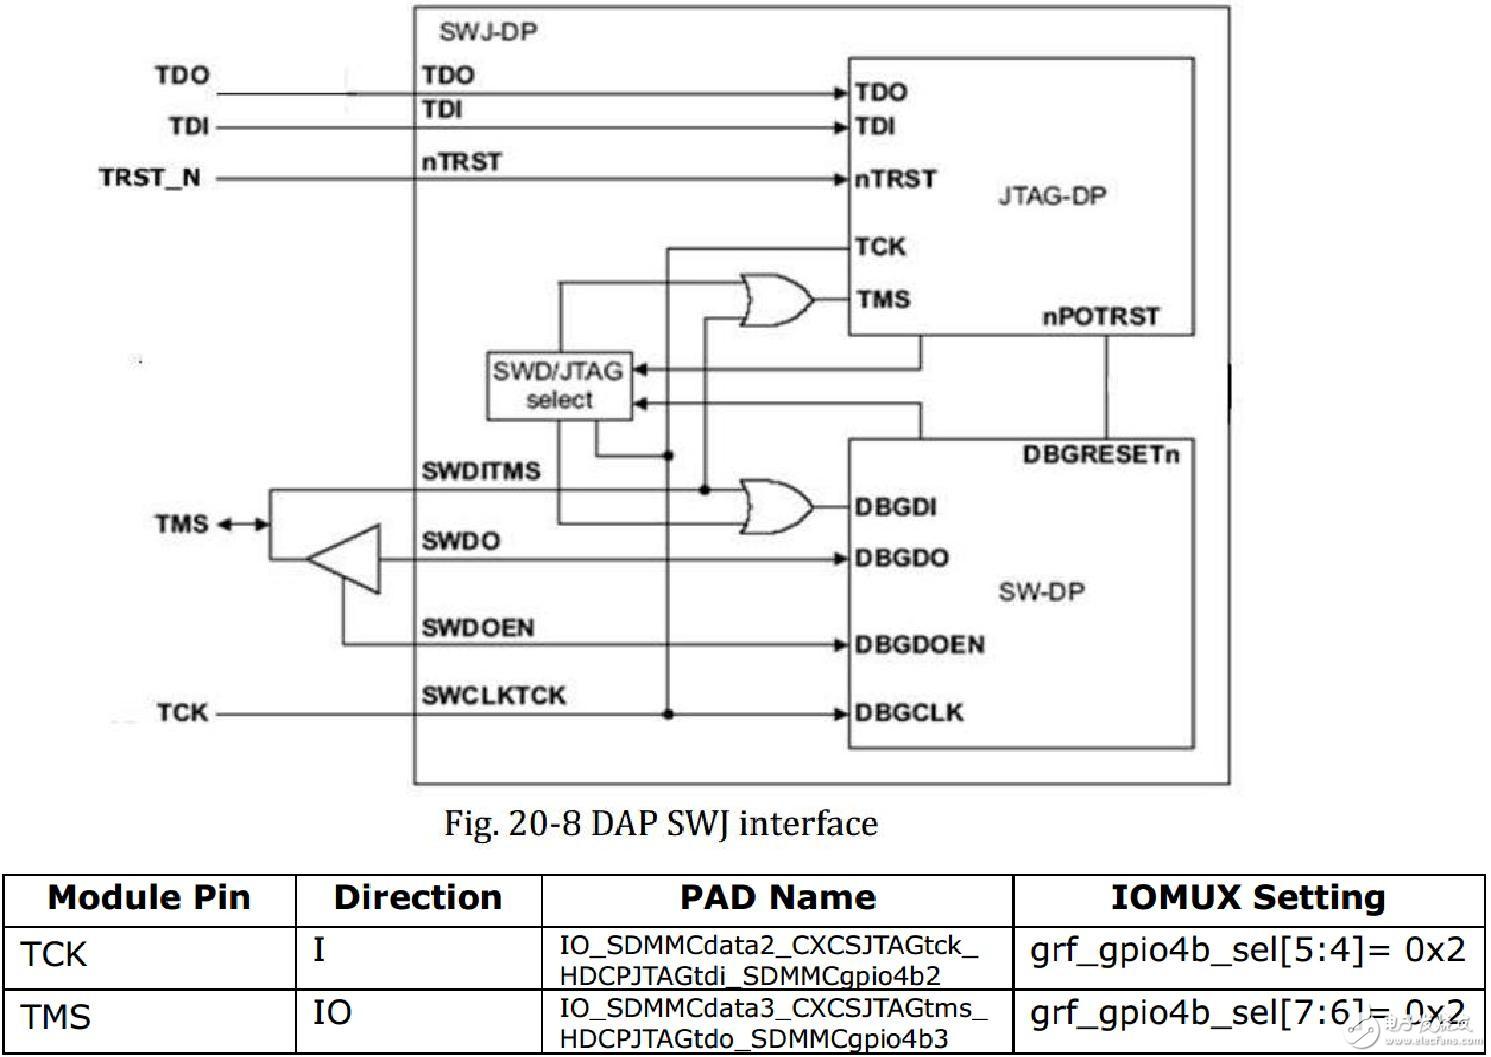 瑞芯微 RK3399 JTAG 配置指南